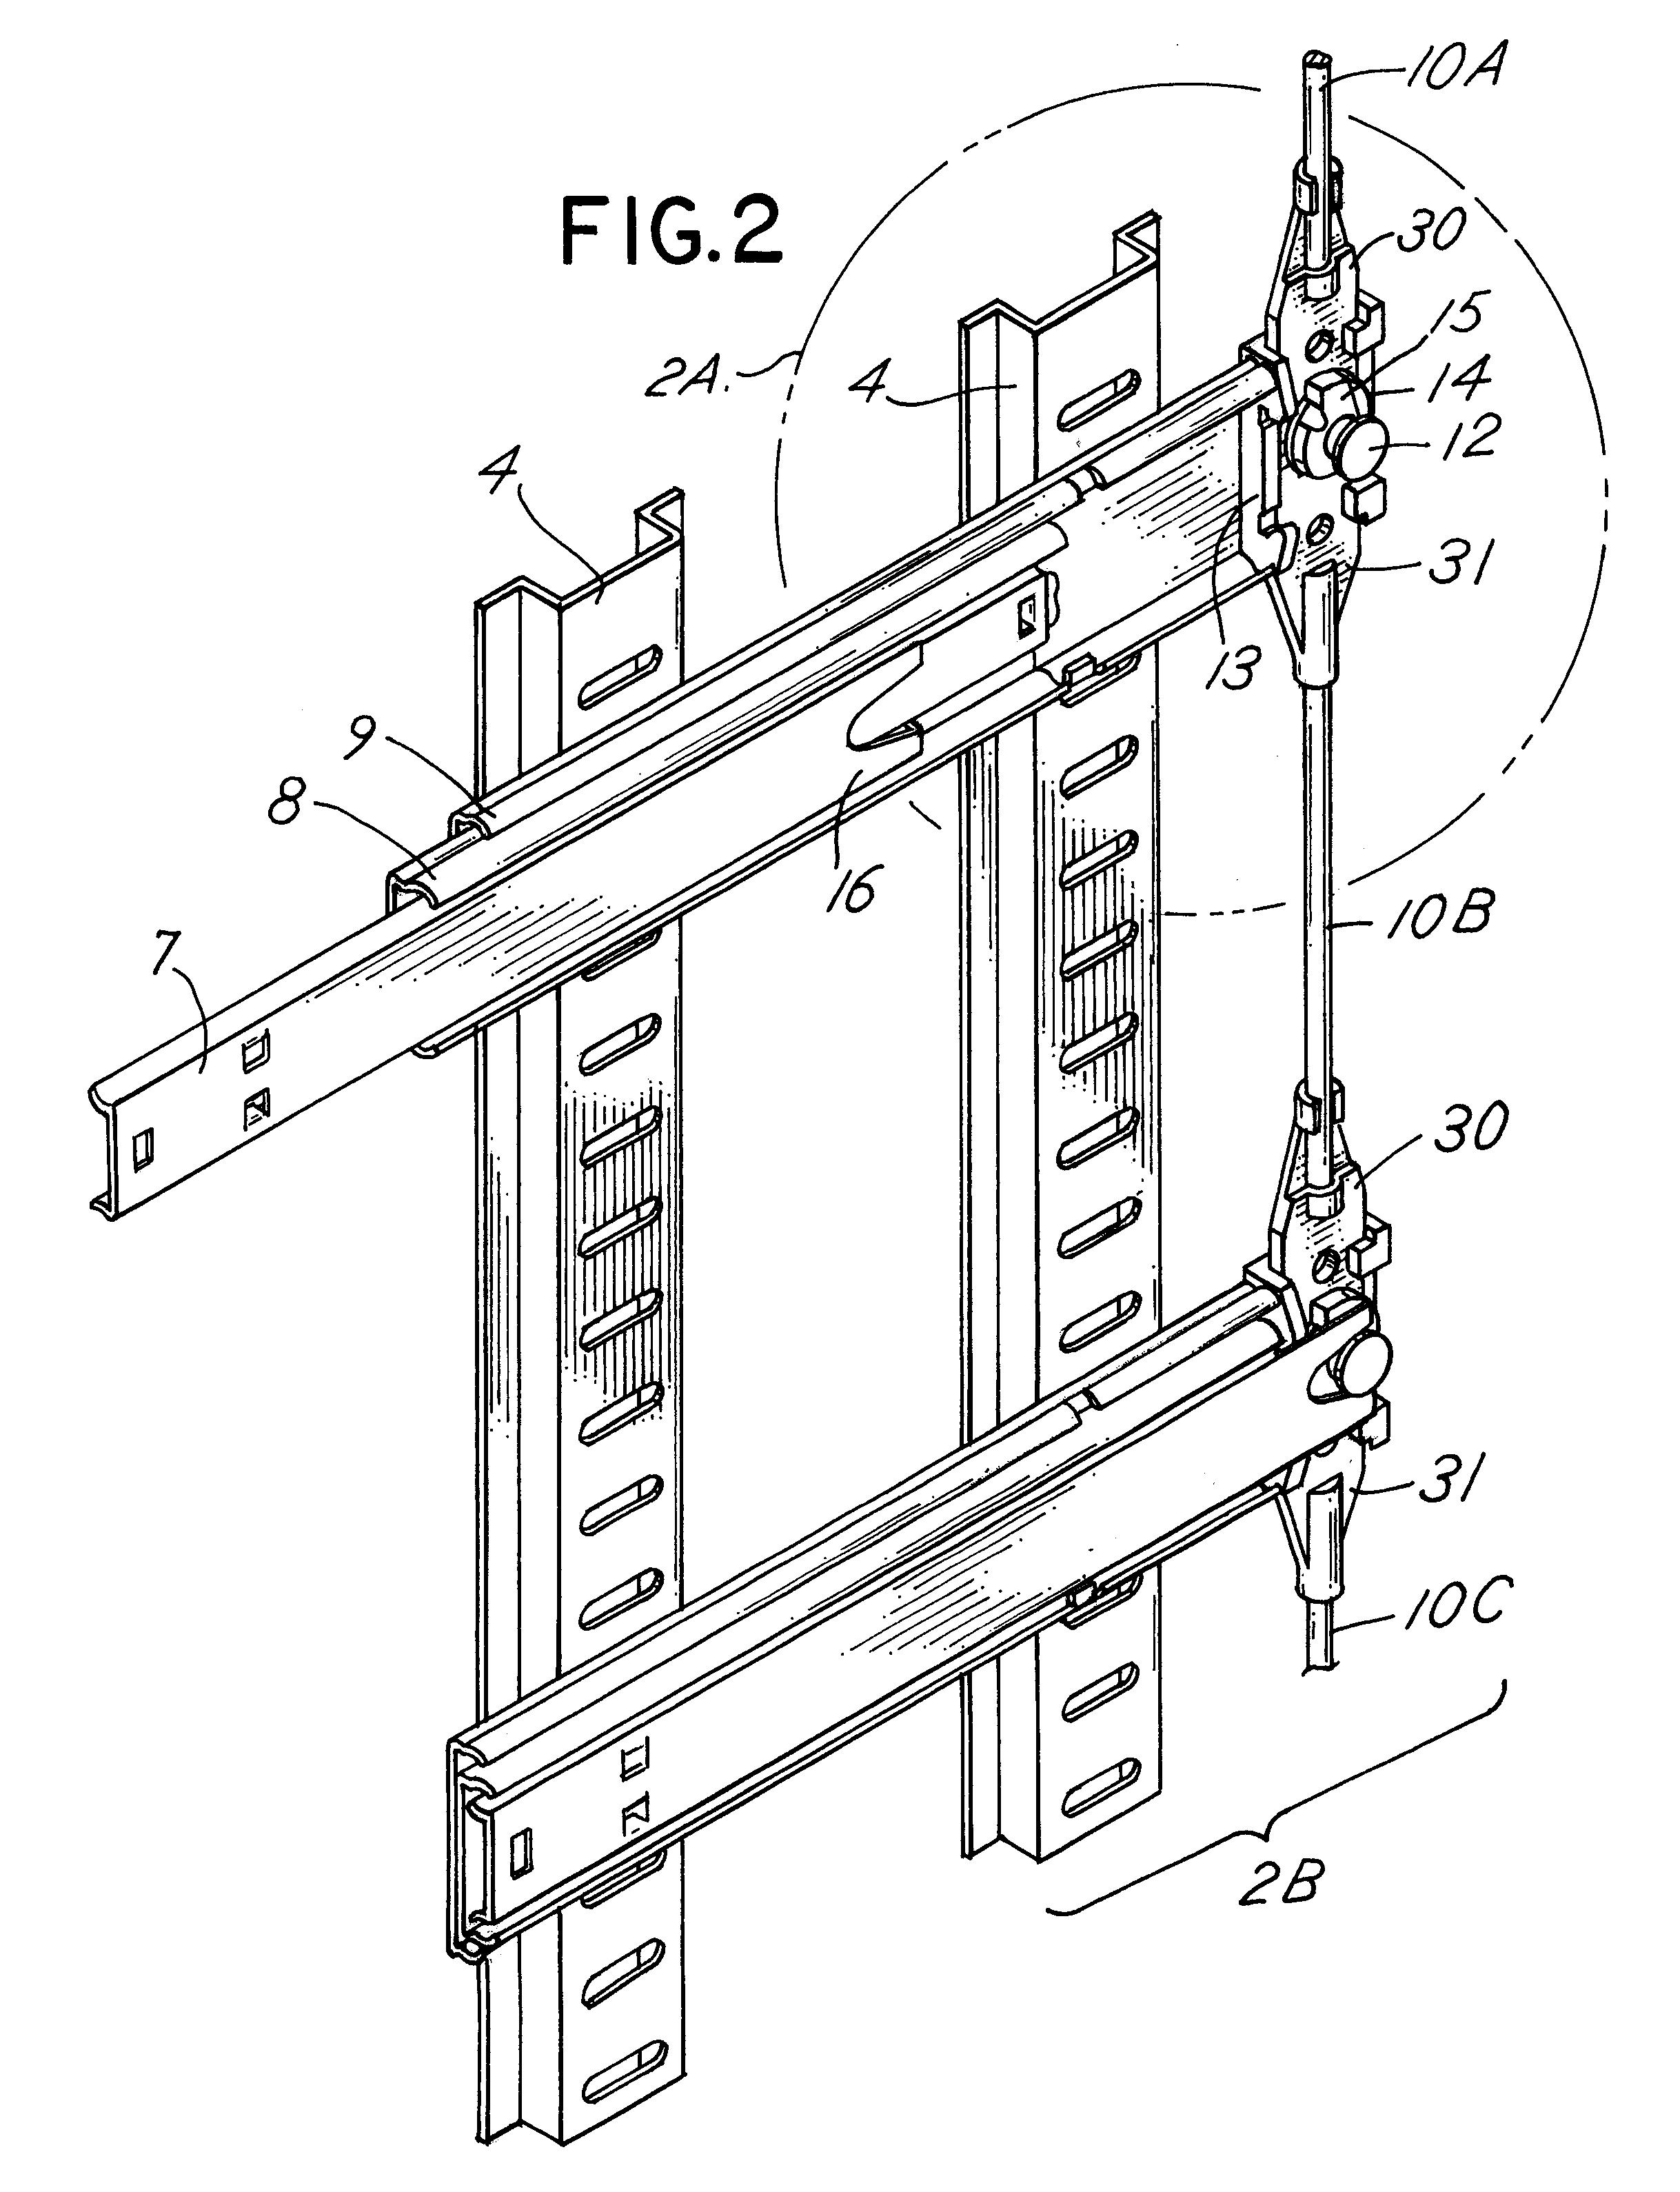 cabinet door diagram patent us6238024 - linkage member for an anti-tip ...